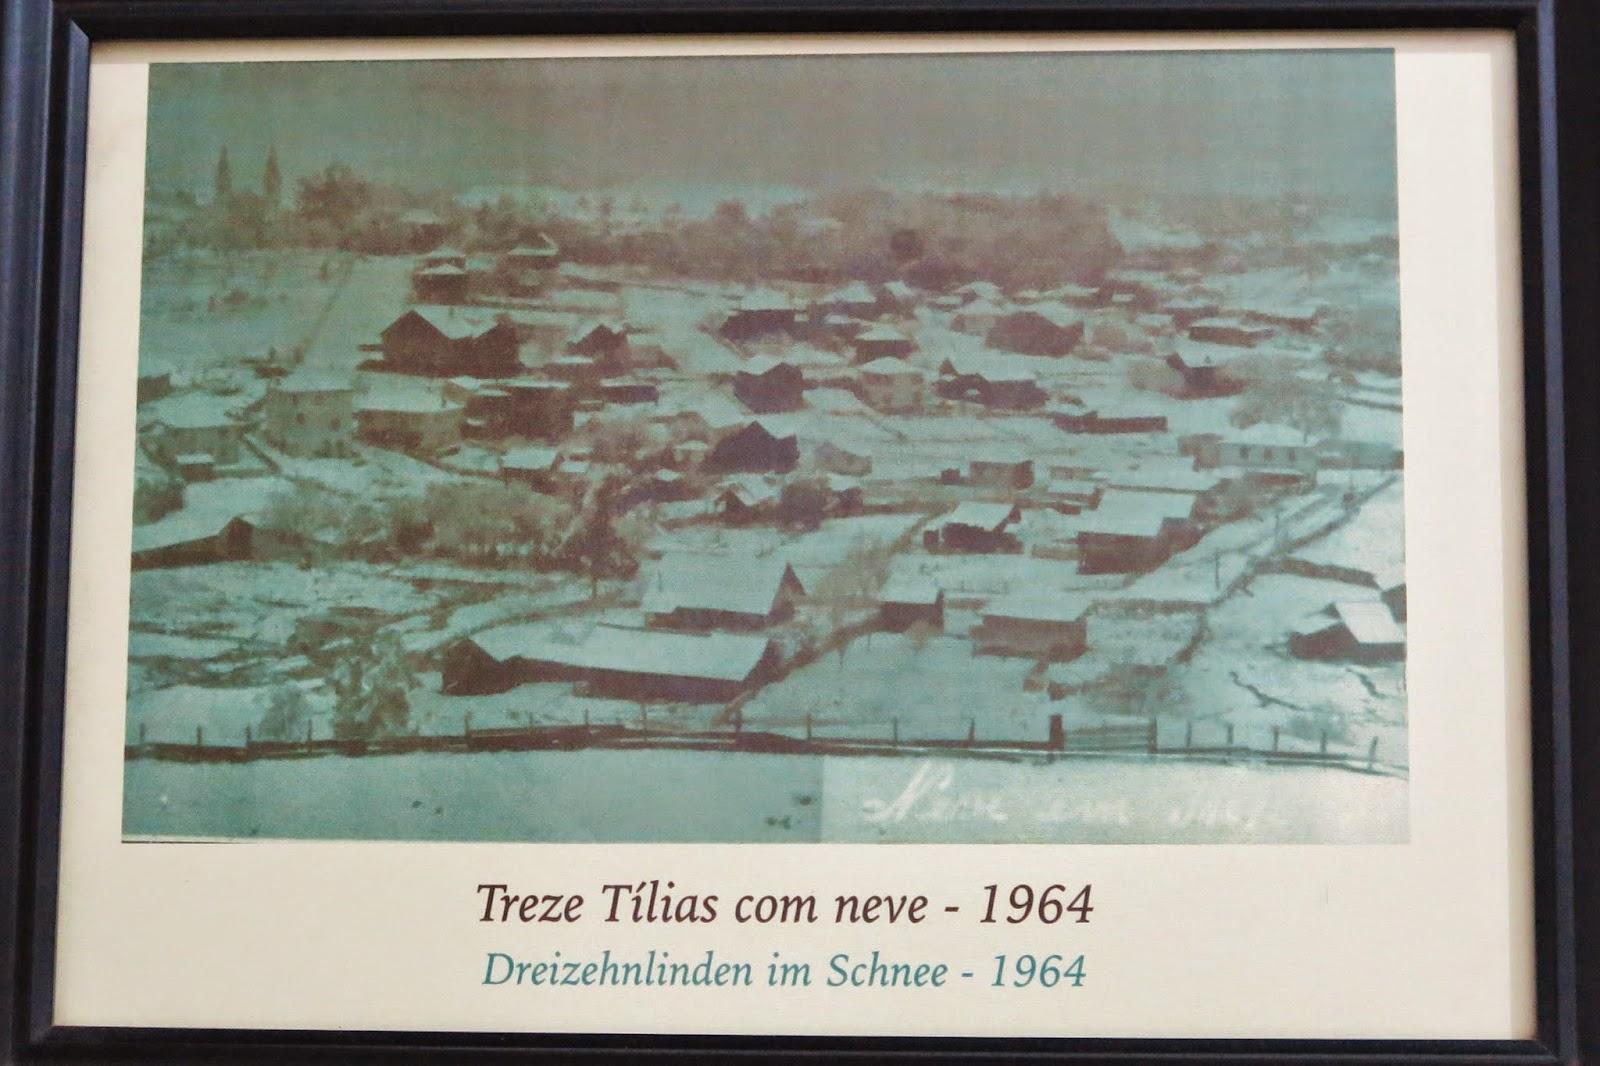 Foto na casa de Andreas Thaler, fundador de Treze Tílias